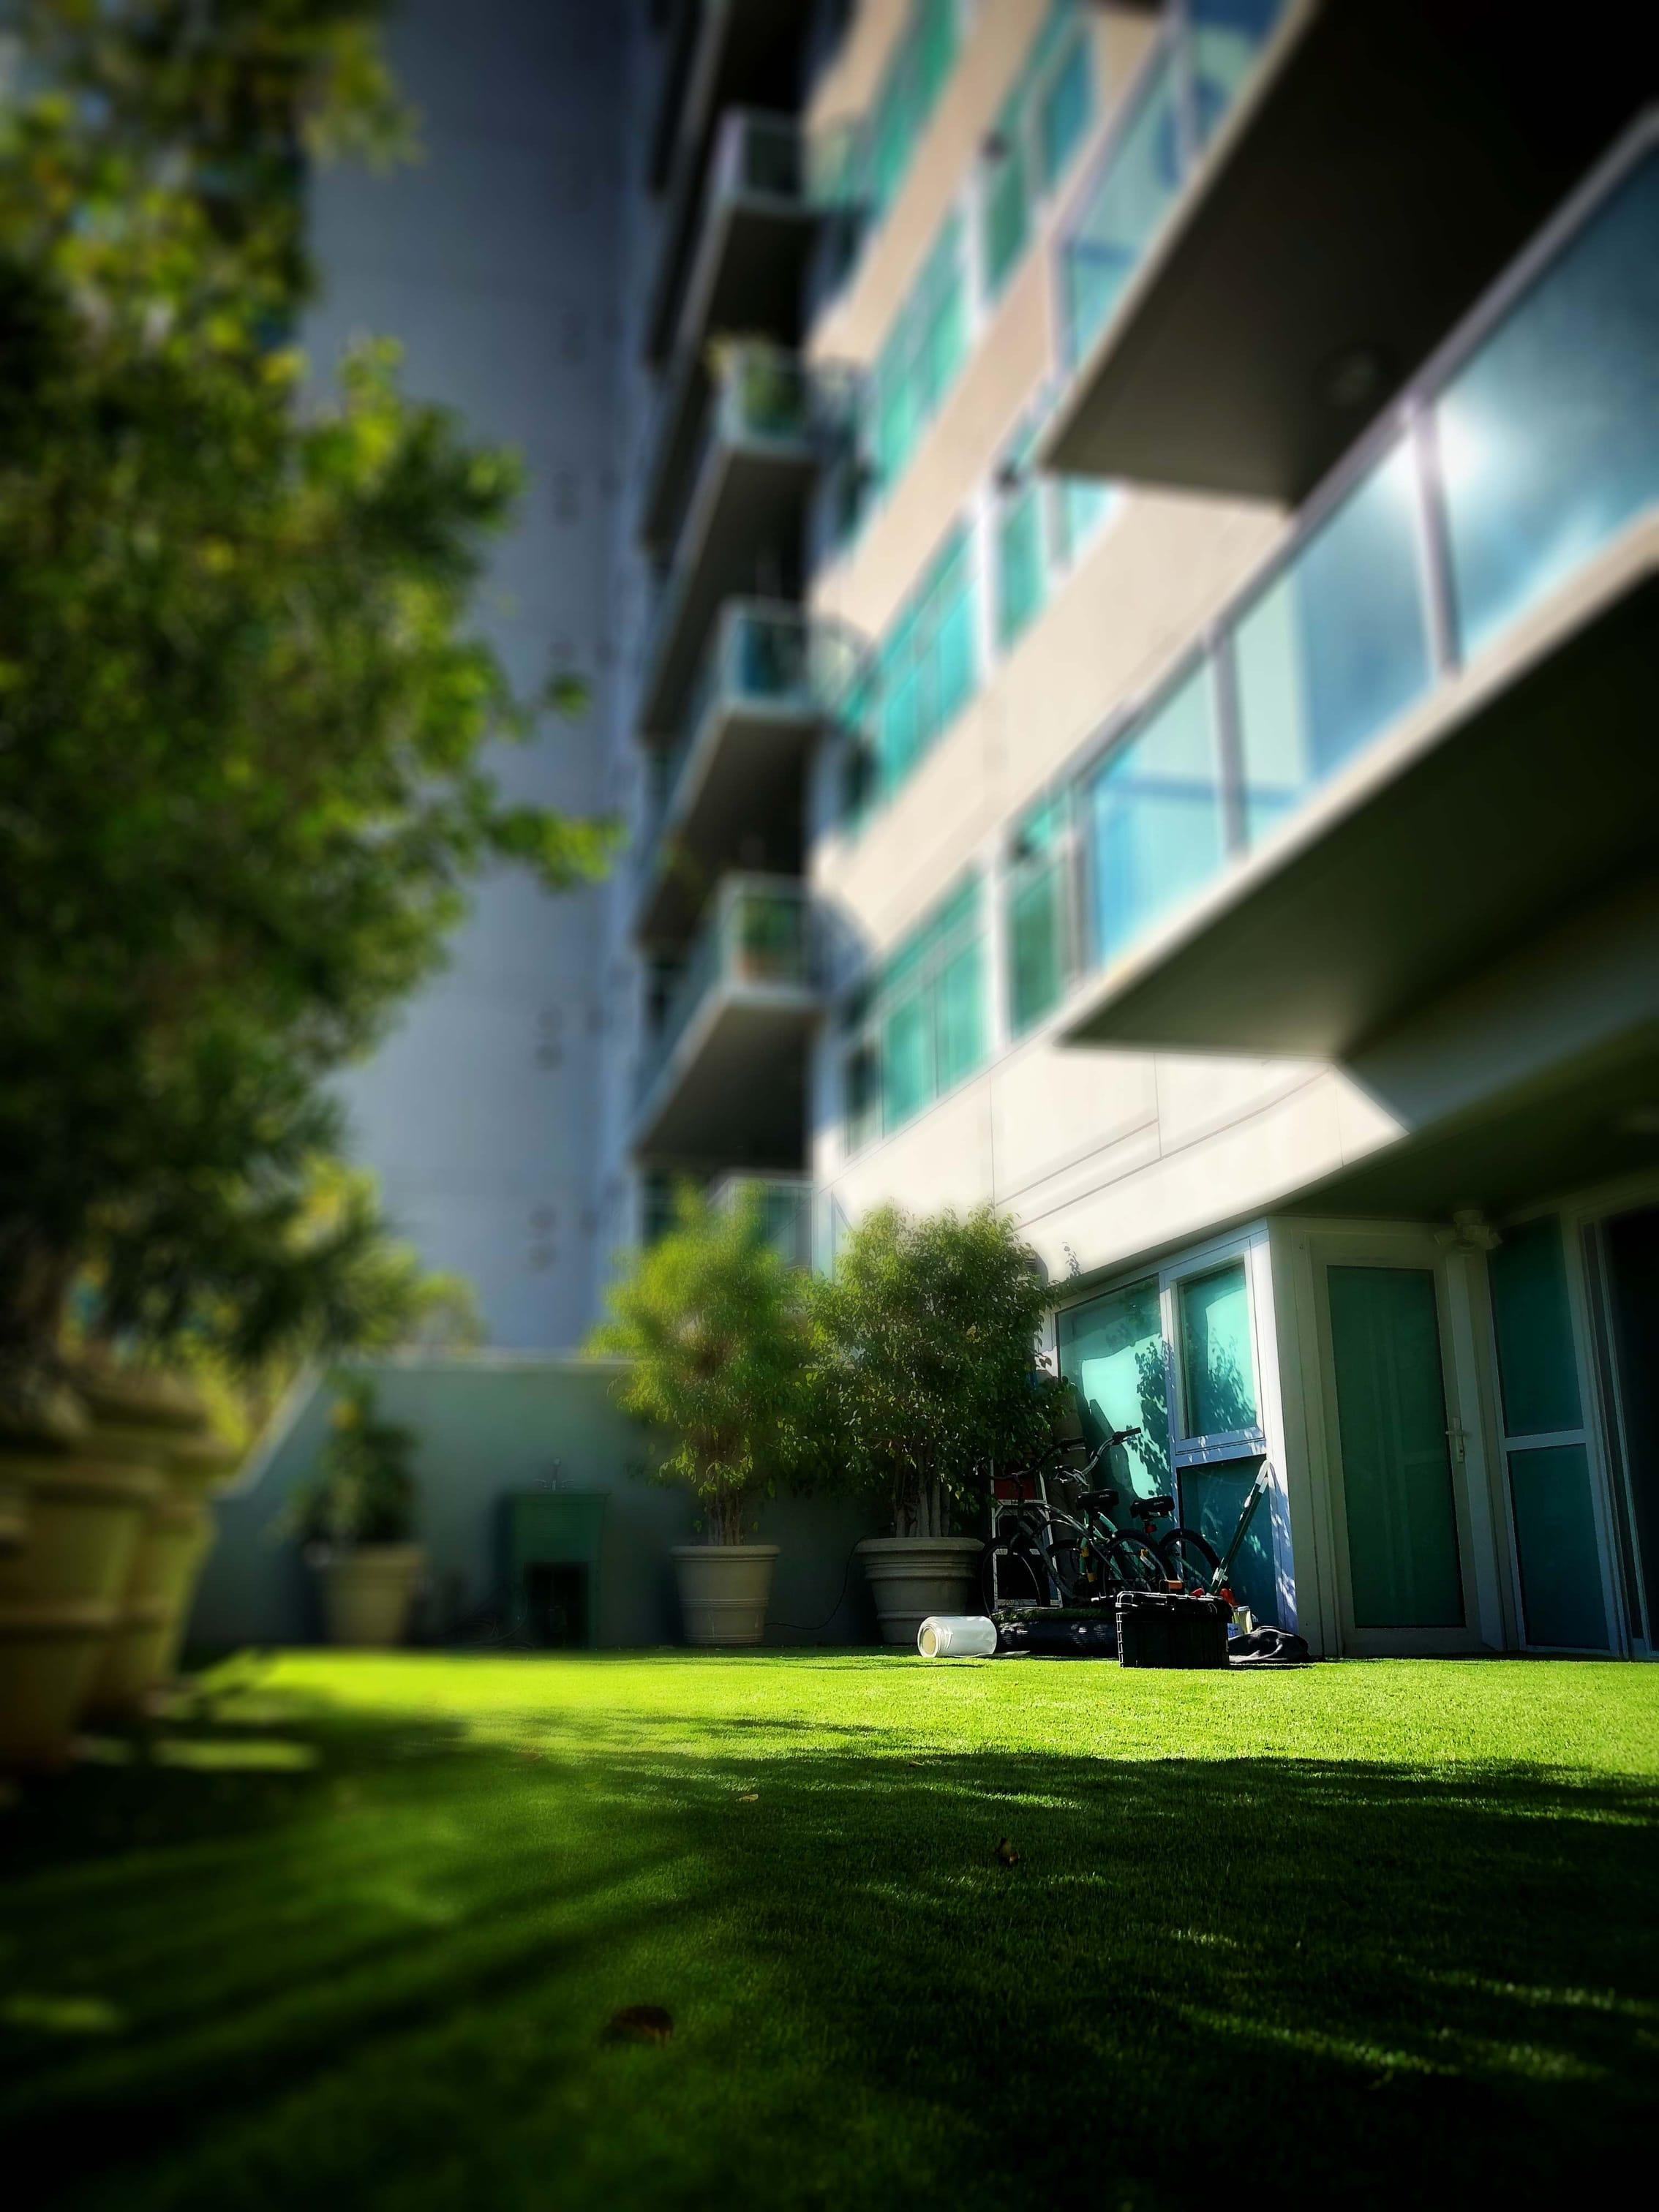 atificial grass balcony 2